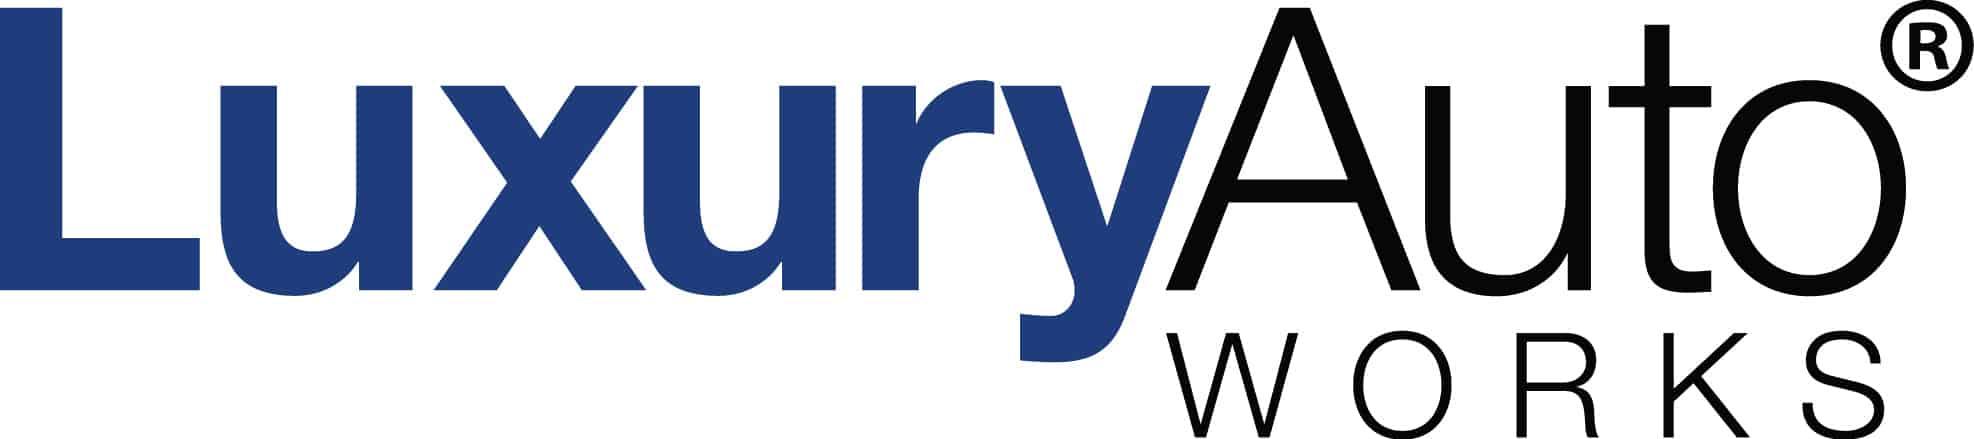 Luxury Auto Works logo